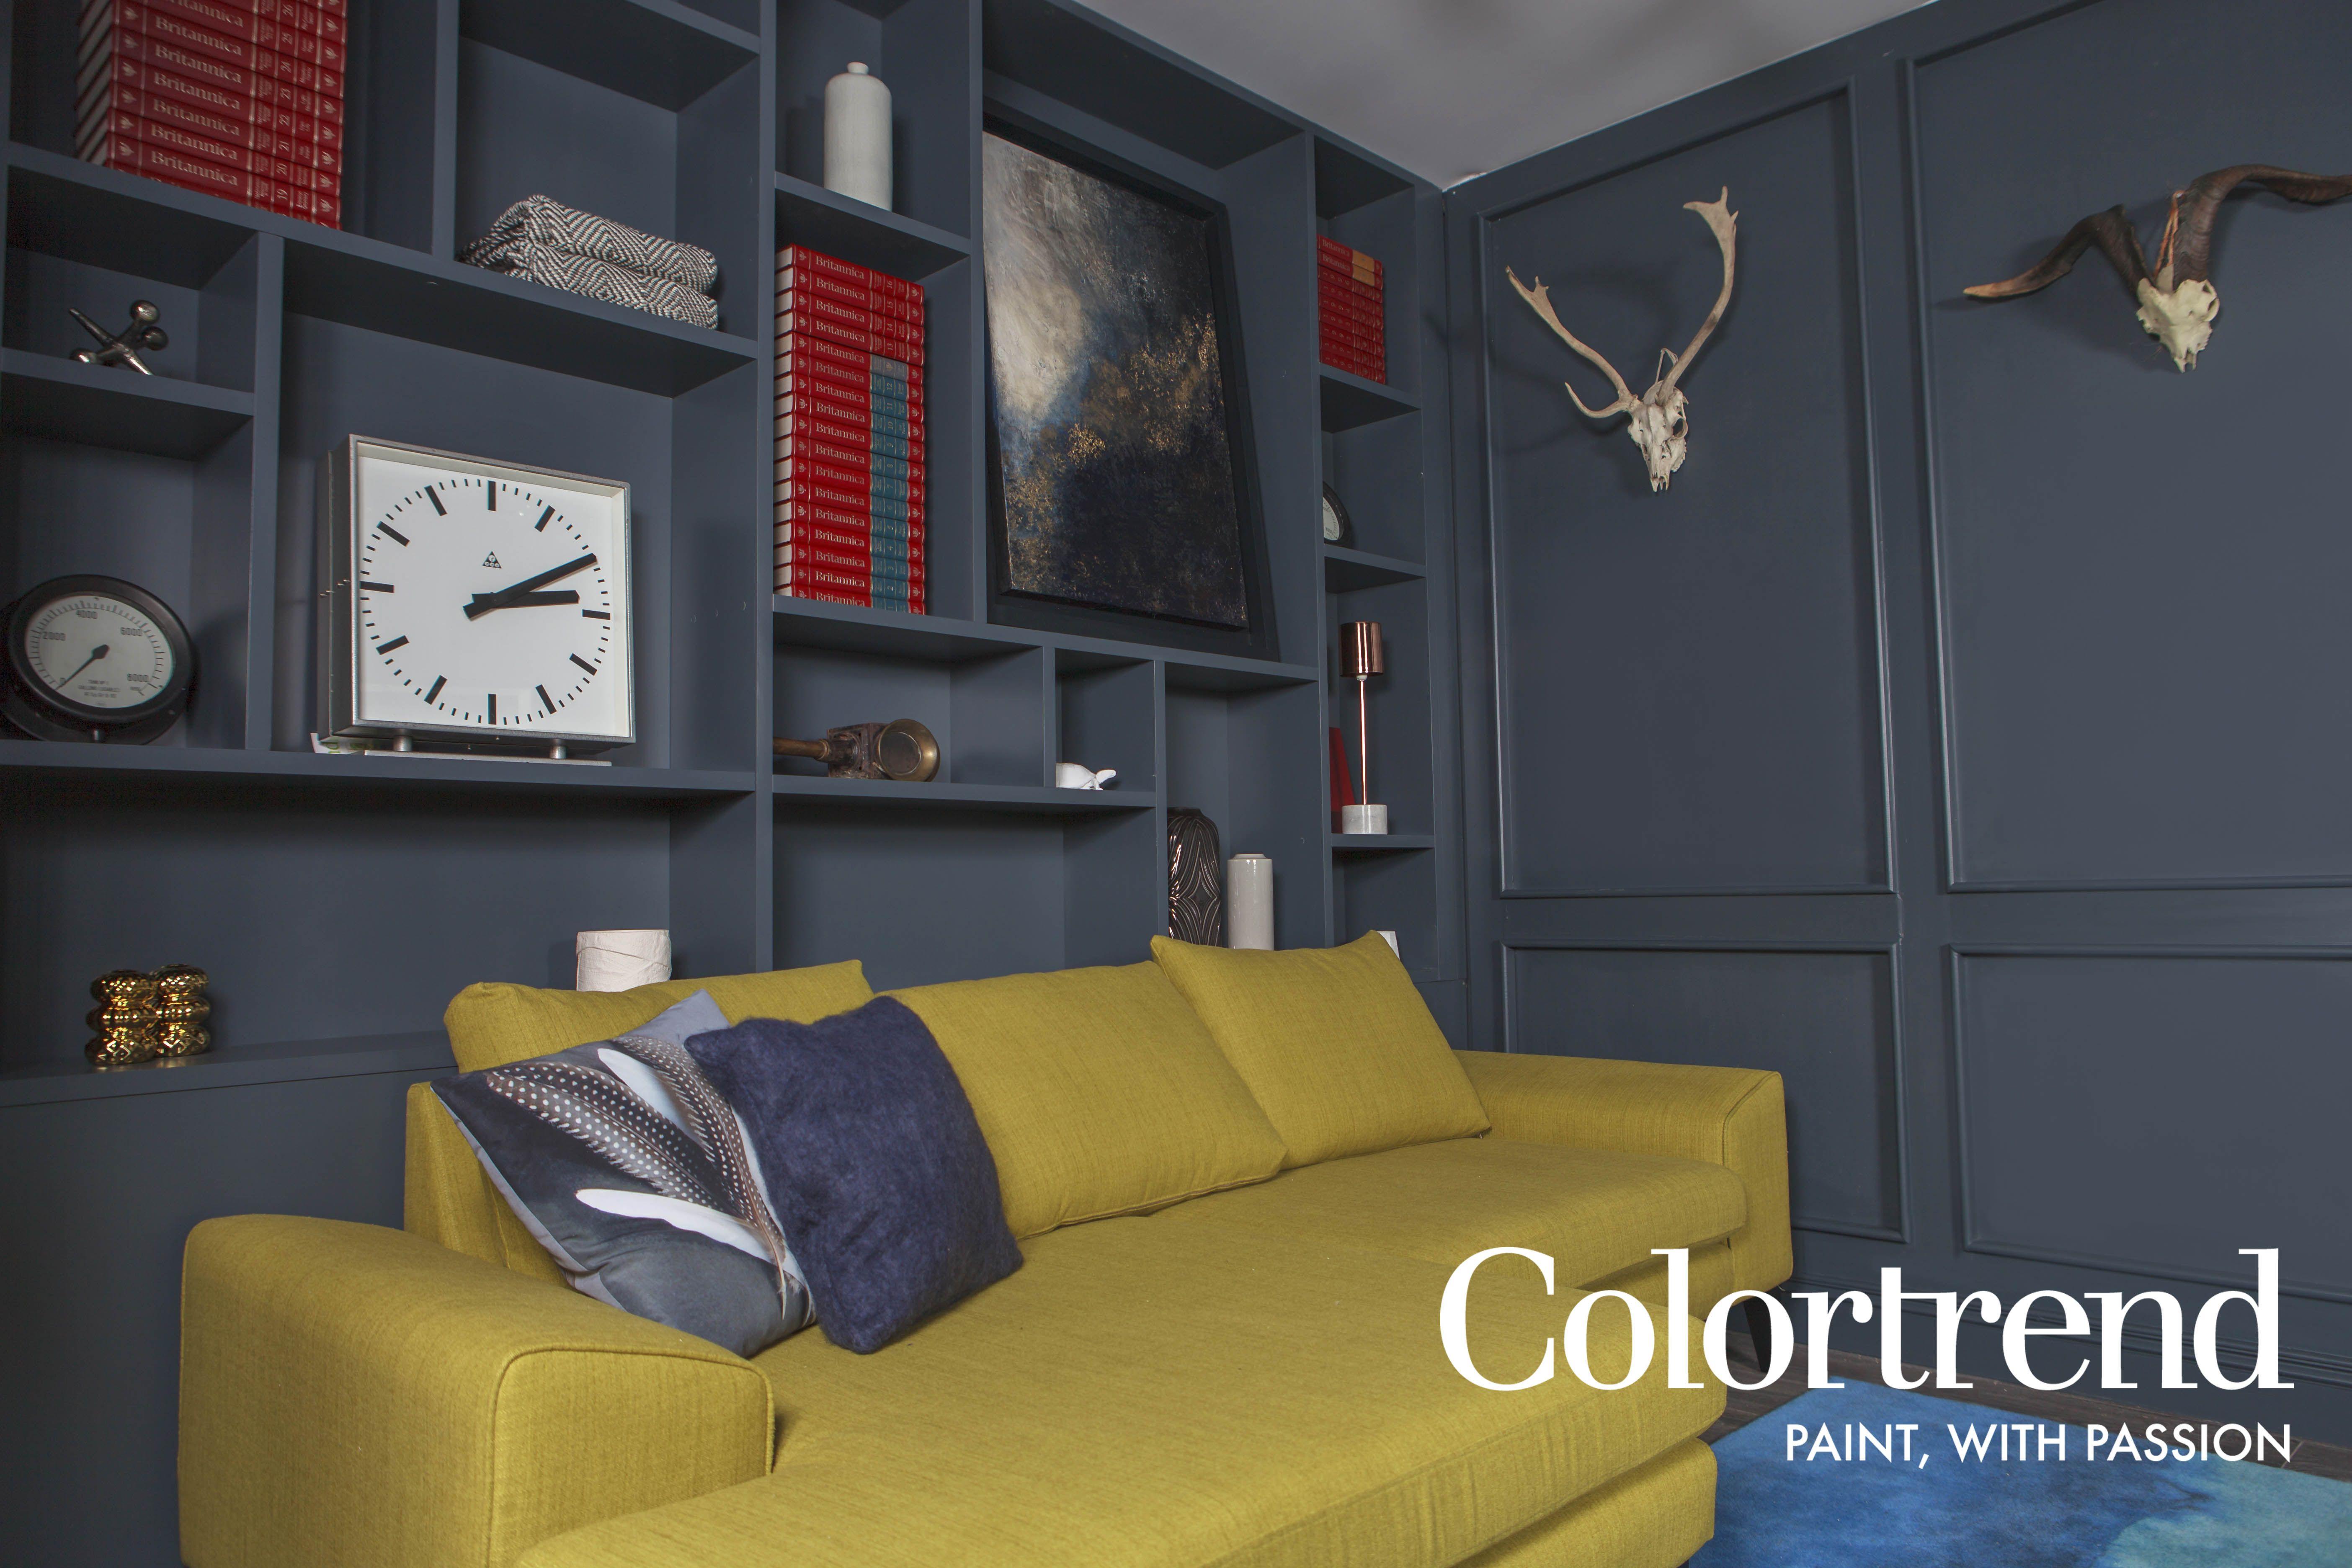 Kingston lafferty design ideal homes showhouse librarytemplar